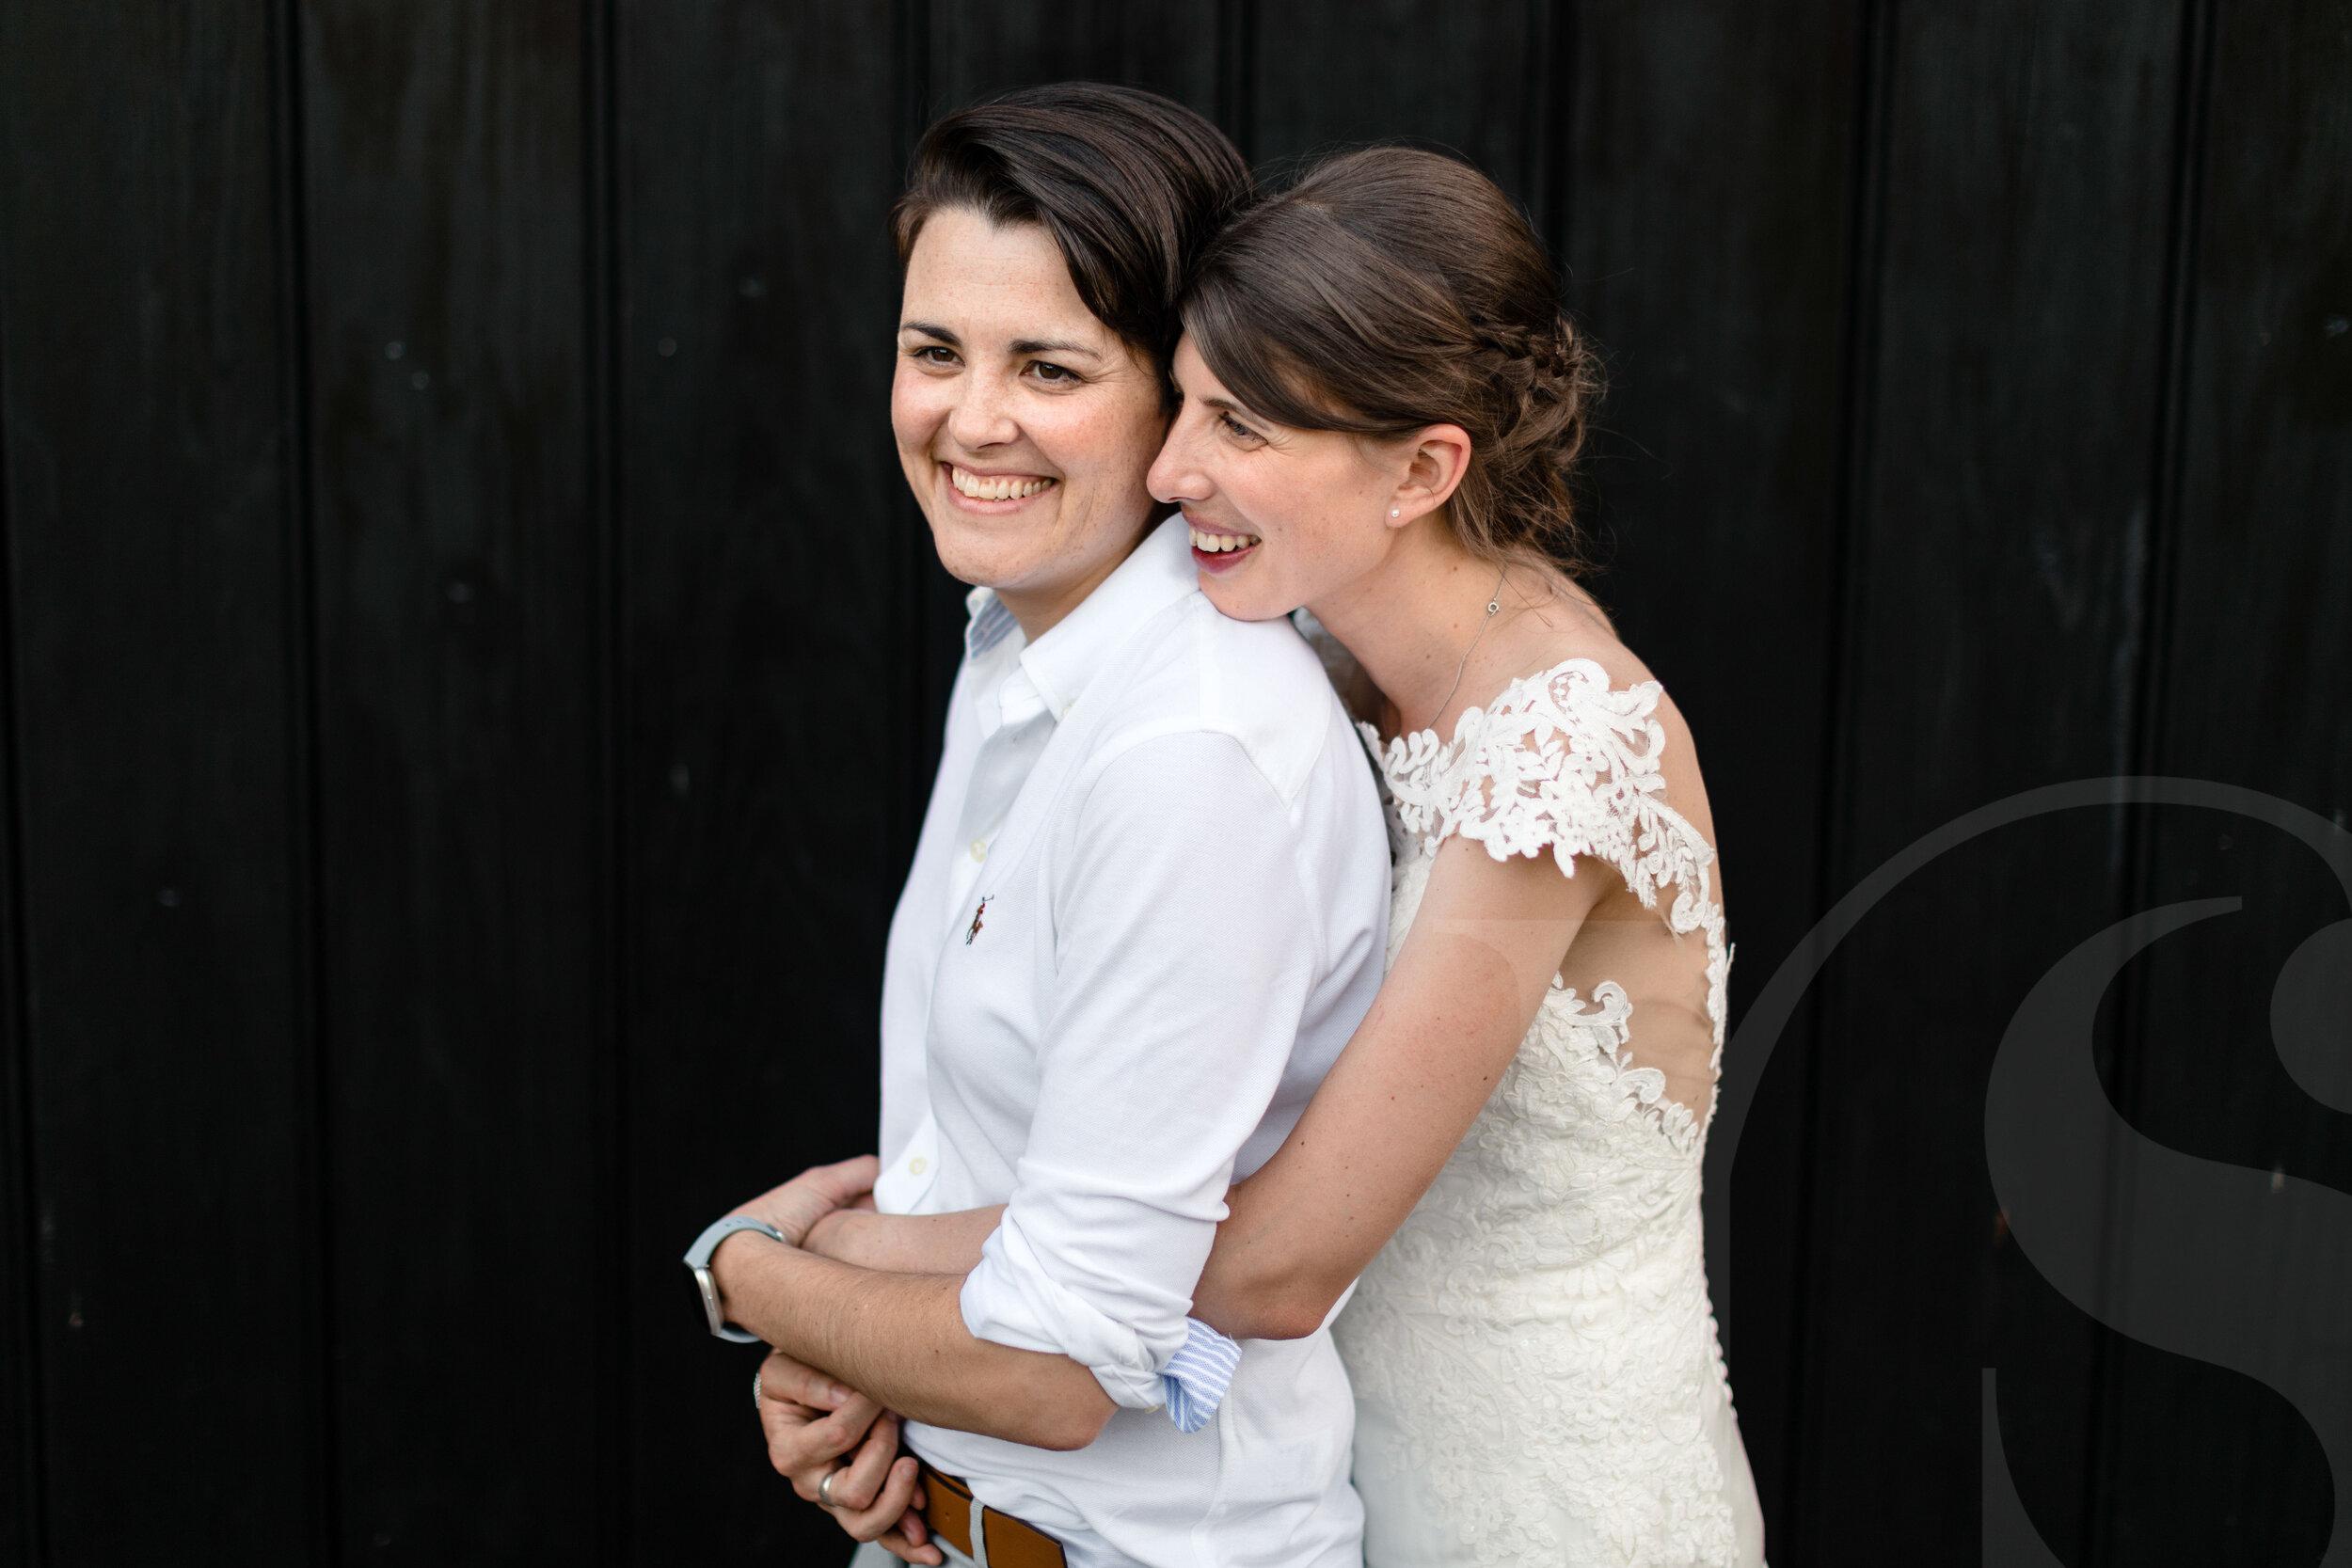 same-sex-wedding-photographer-2.jpg